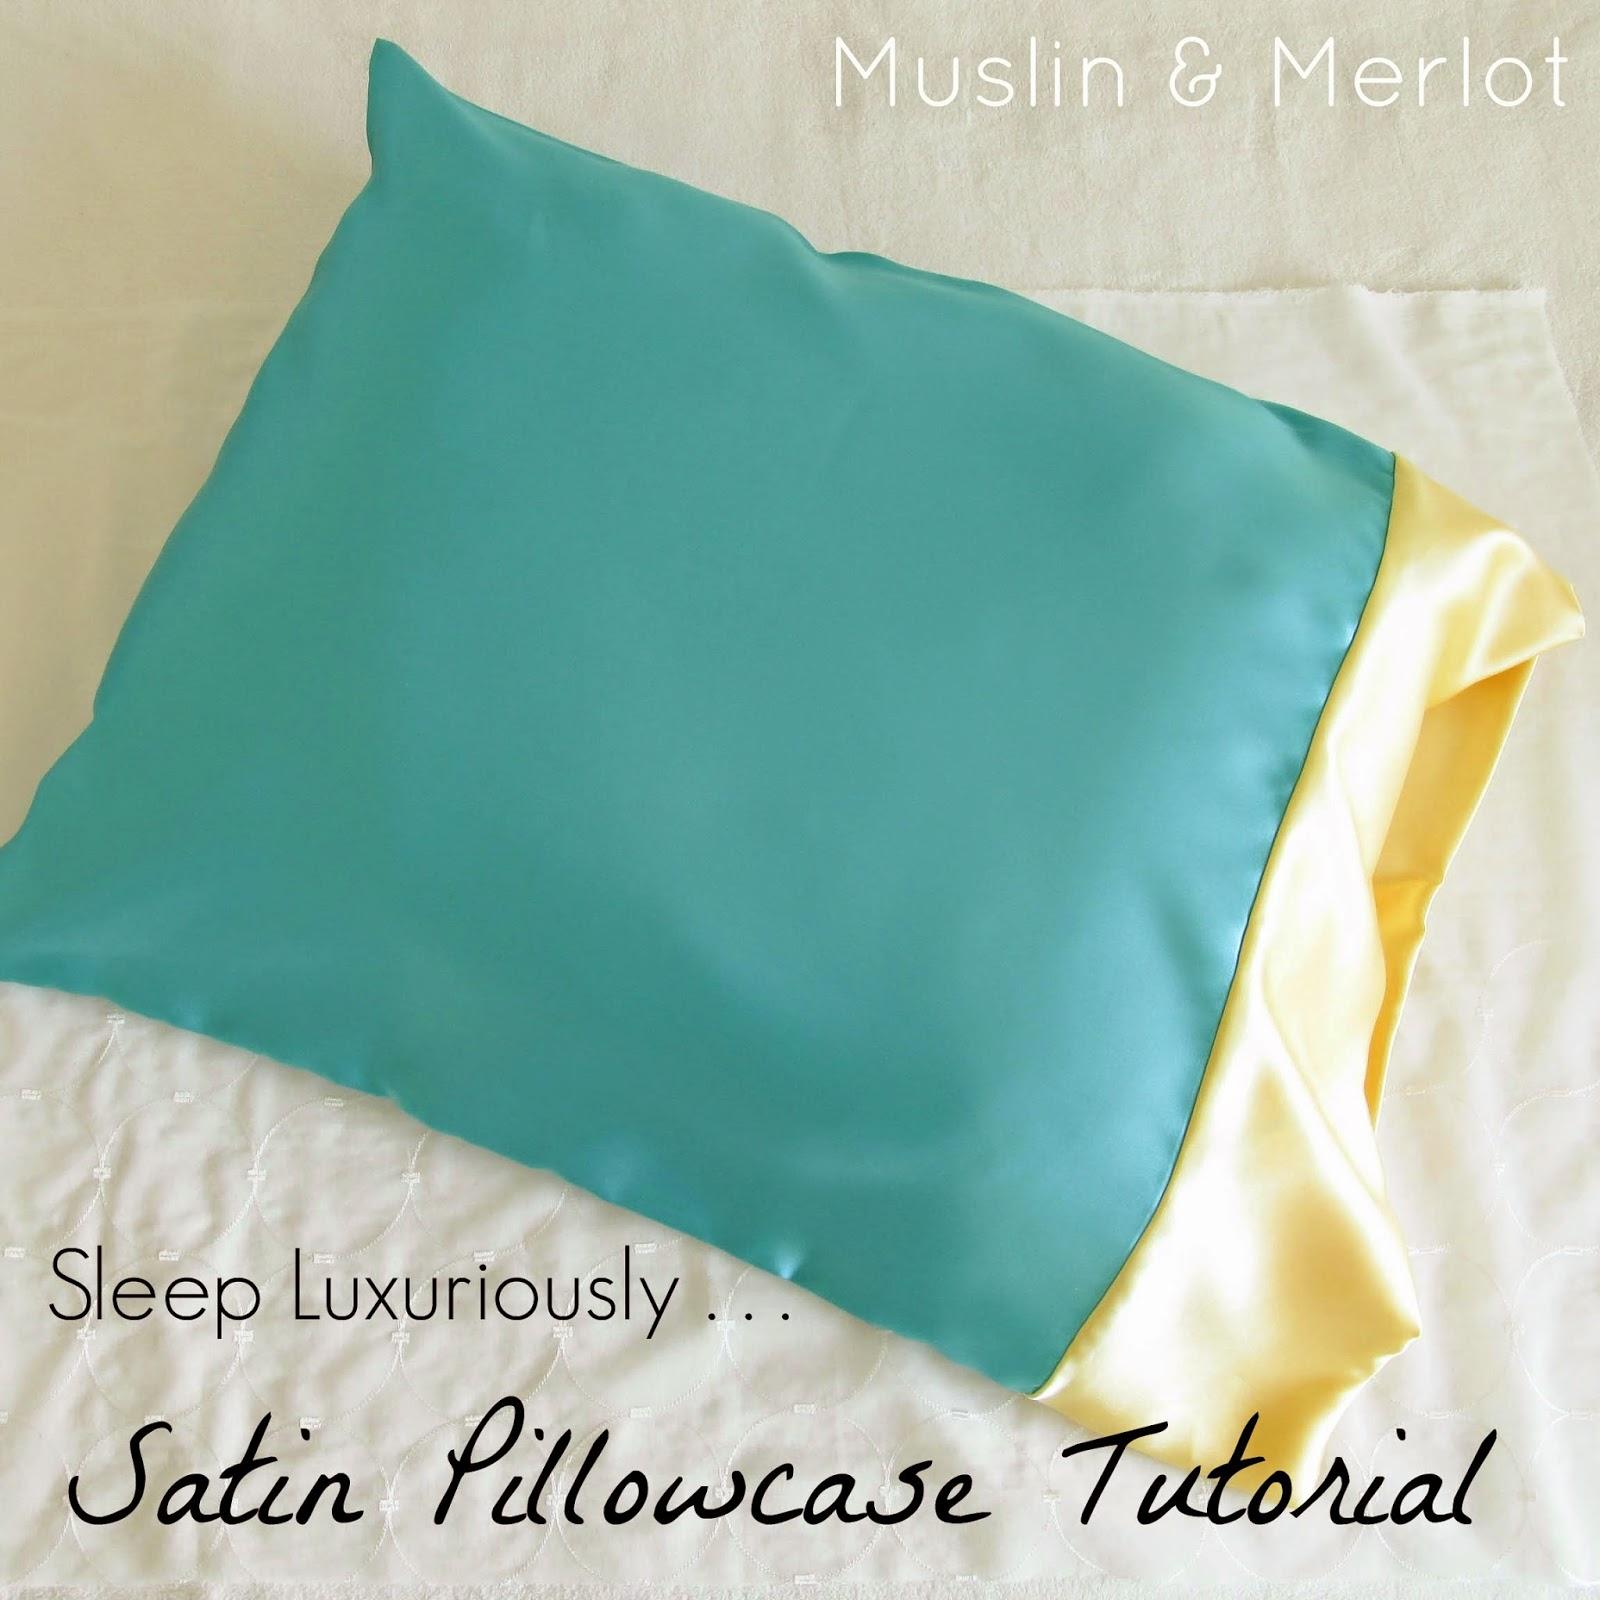 Diy Satin Pillowcase: Satin Pillowcase Tutorial   Muslin and Merlot,